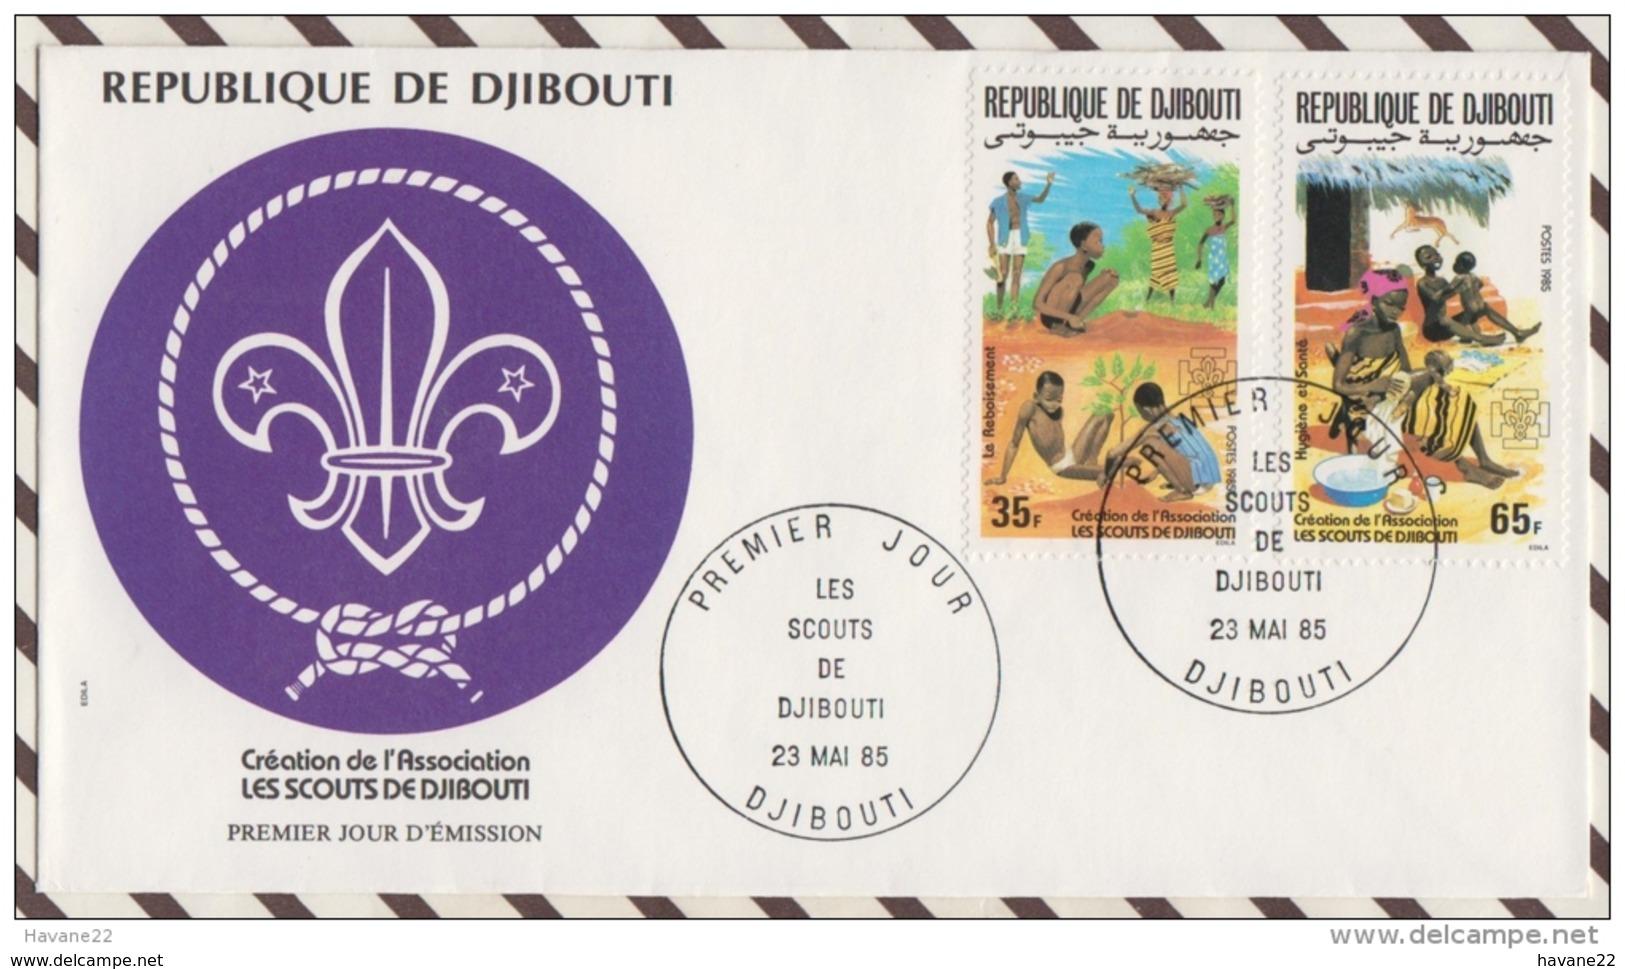 FDC 19 ENVELOPPE 1ER JOUR 1985 REPUBLIQUE DE DJIBOUTI CREATION DE L'ASSOCIATION LES SCOUTS DE DJIBOUTI - Djibouti (1977-...)